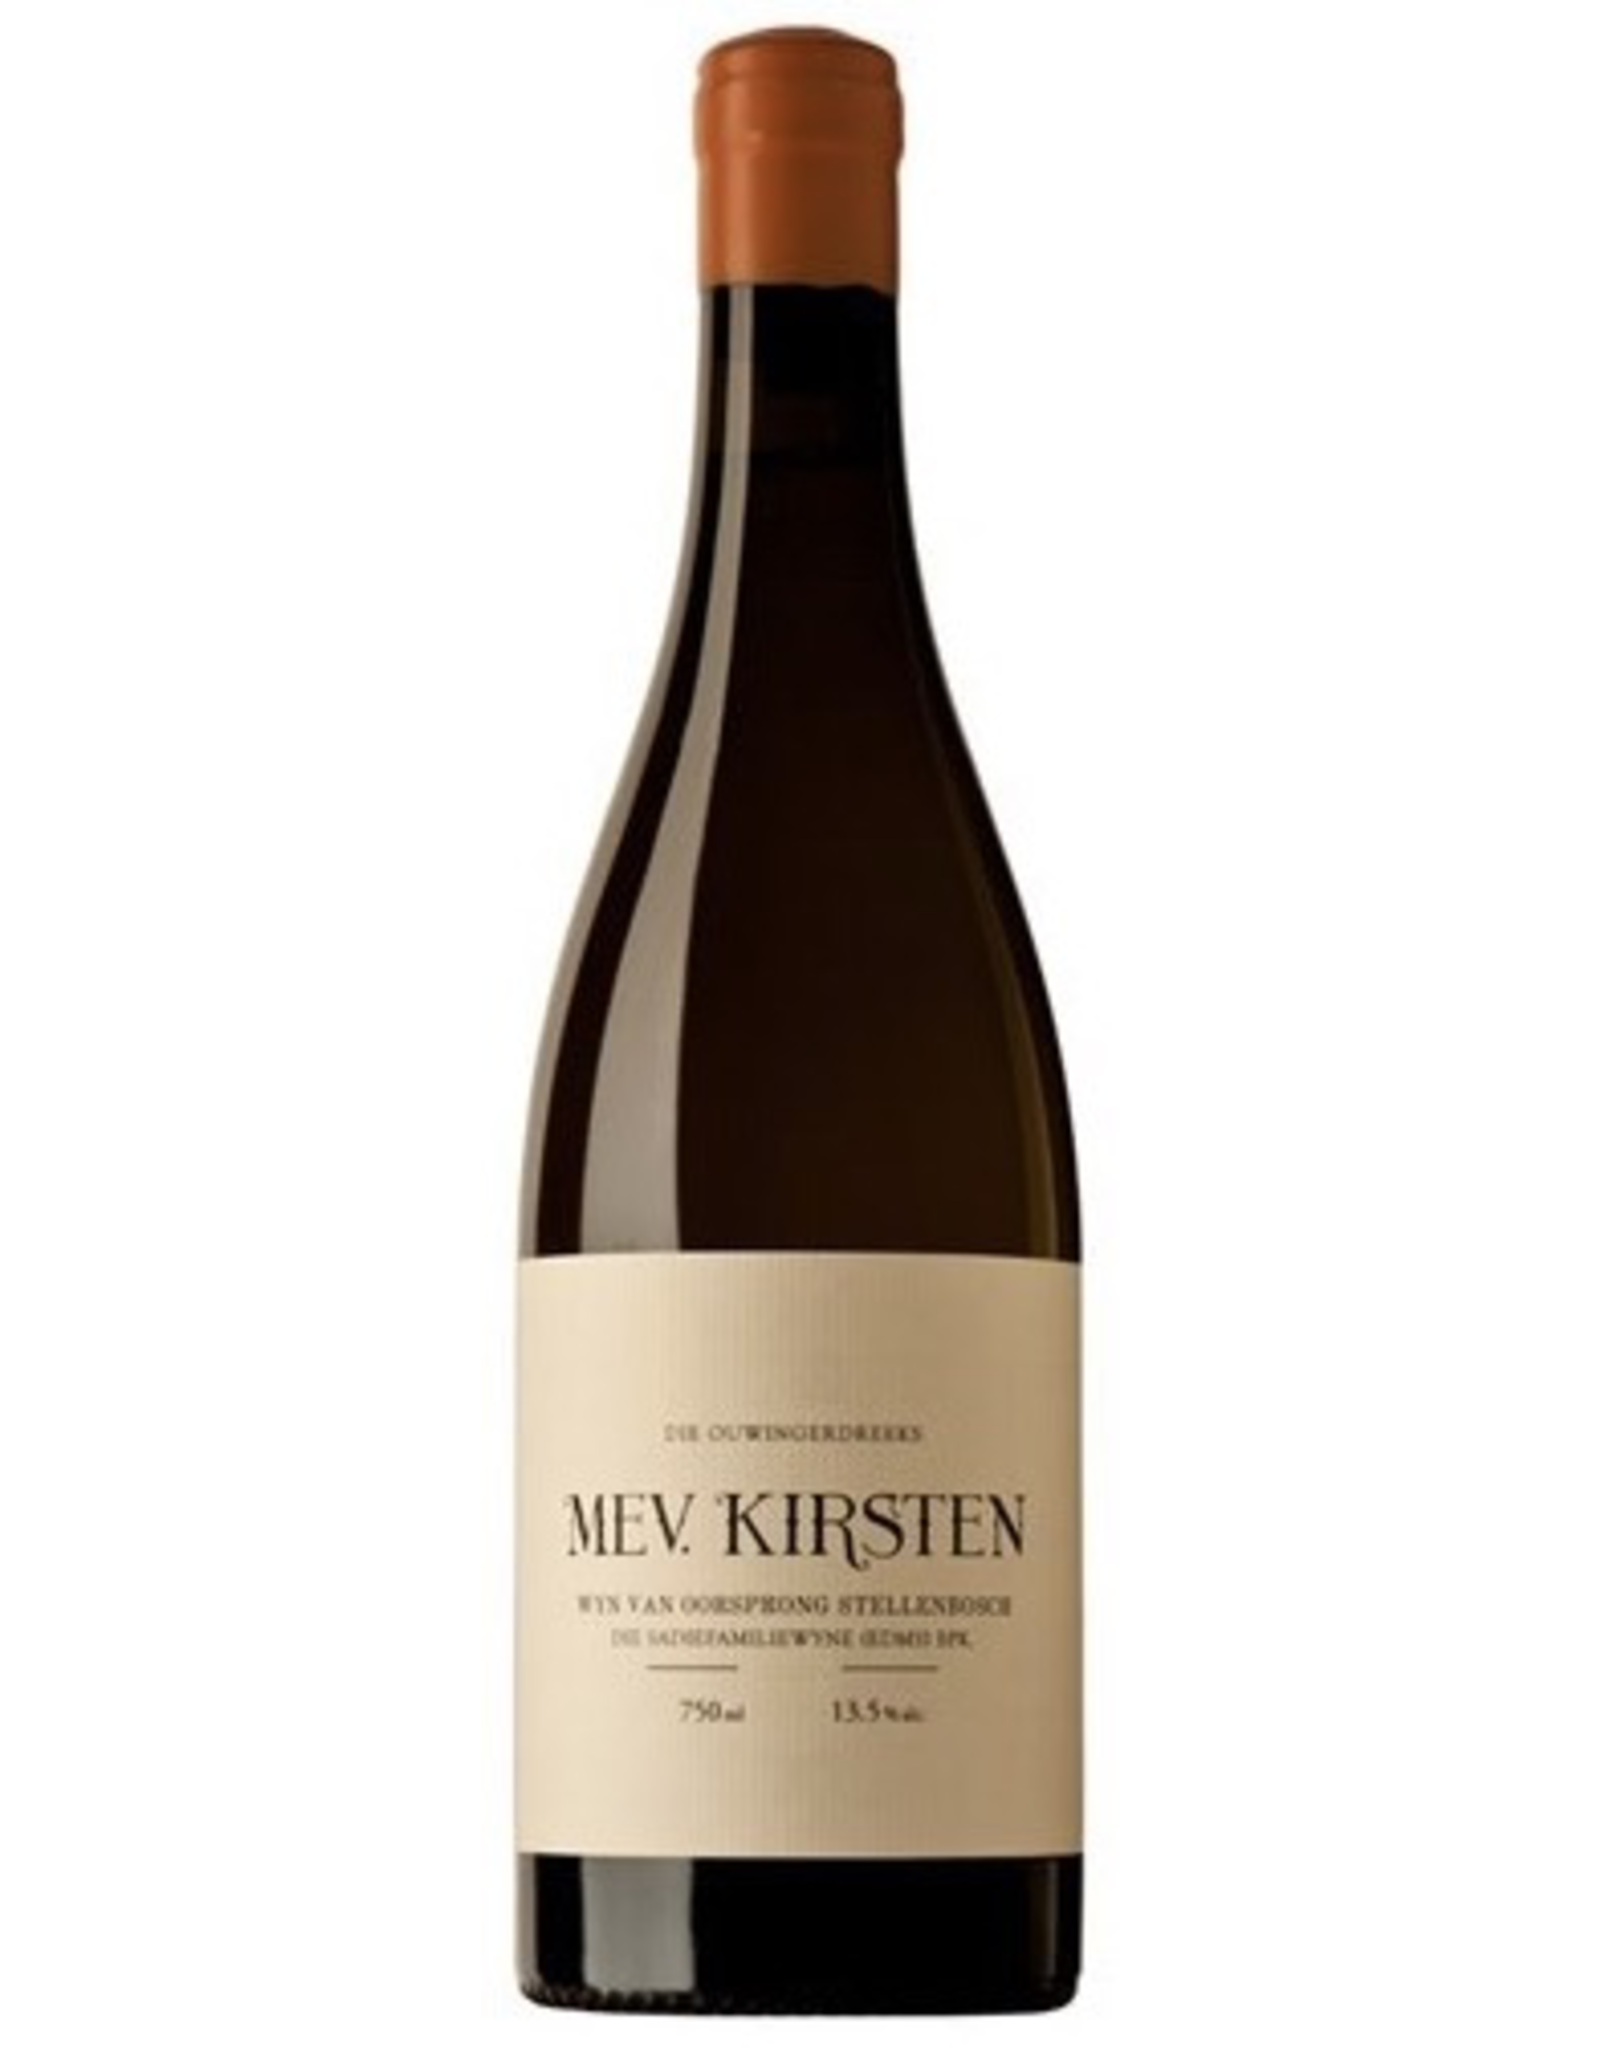 White Wine 2019, Sadie Family Mev. Kristen, Old Vine Chenin Blanc, Swartland, Coastal Region, South Africa, 13% Alc, CTnr